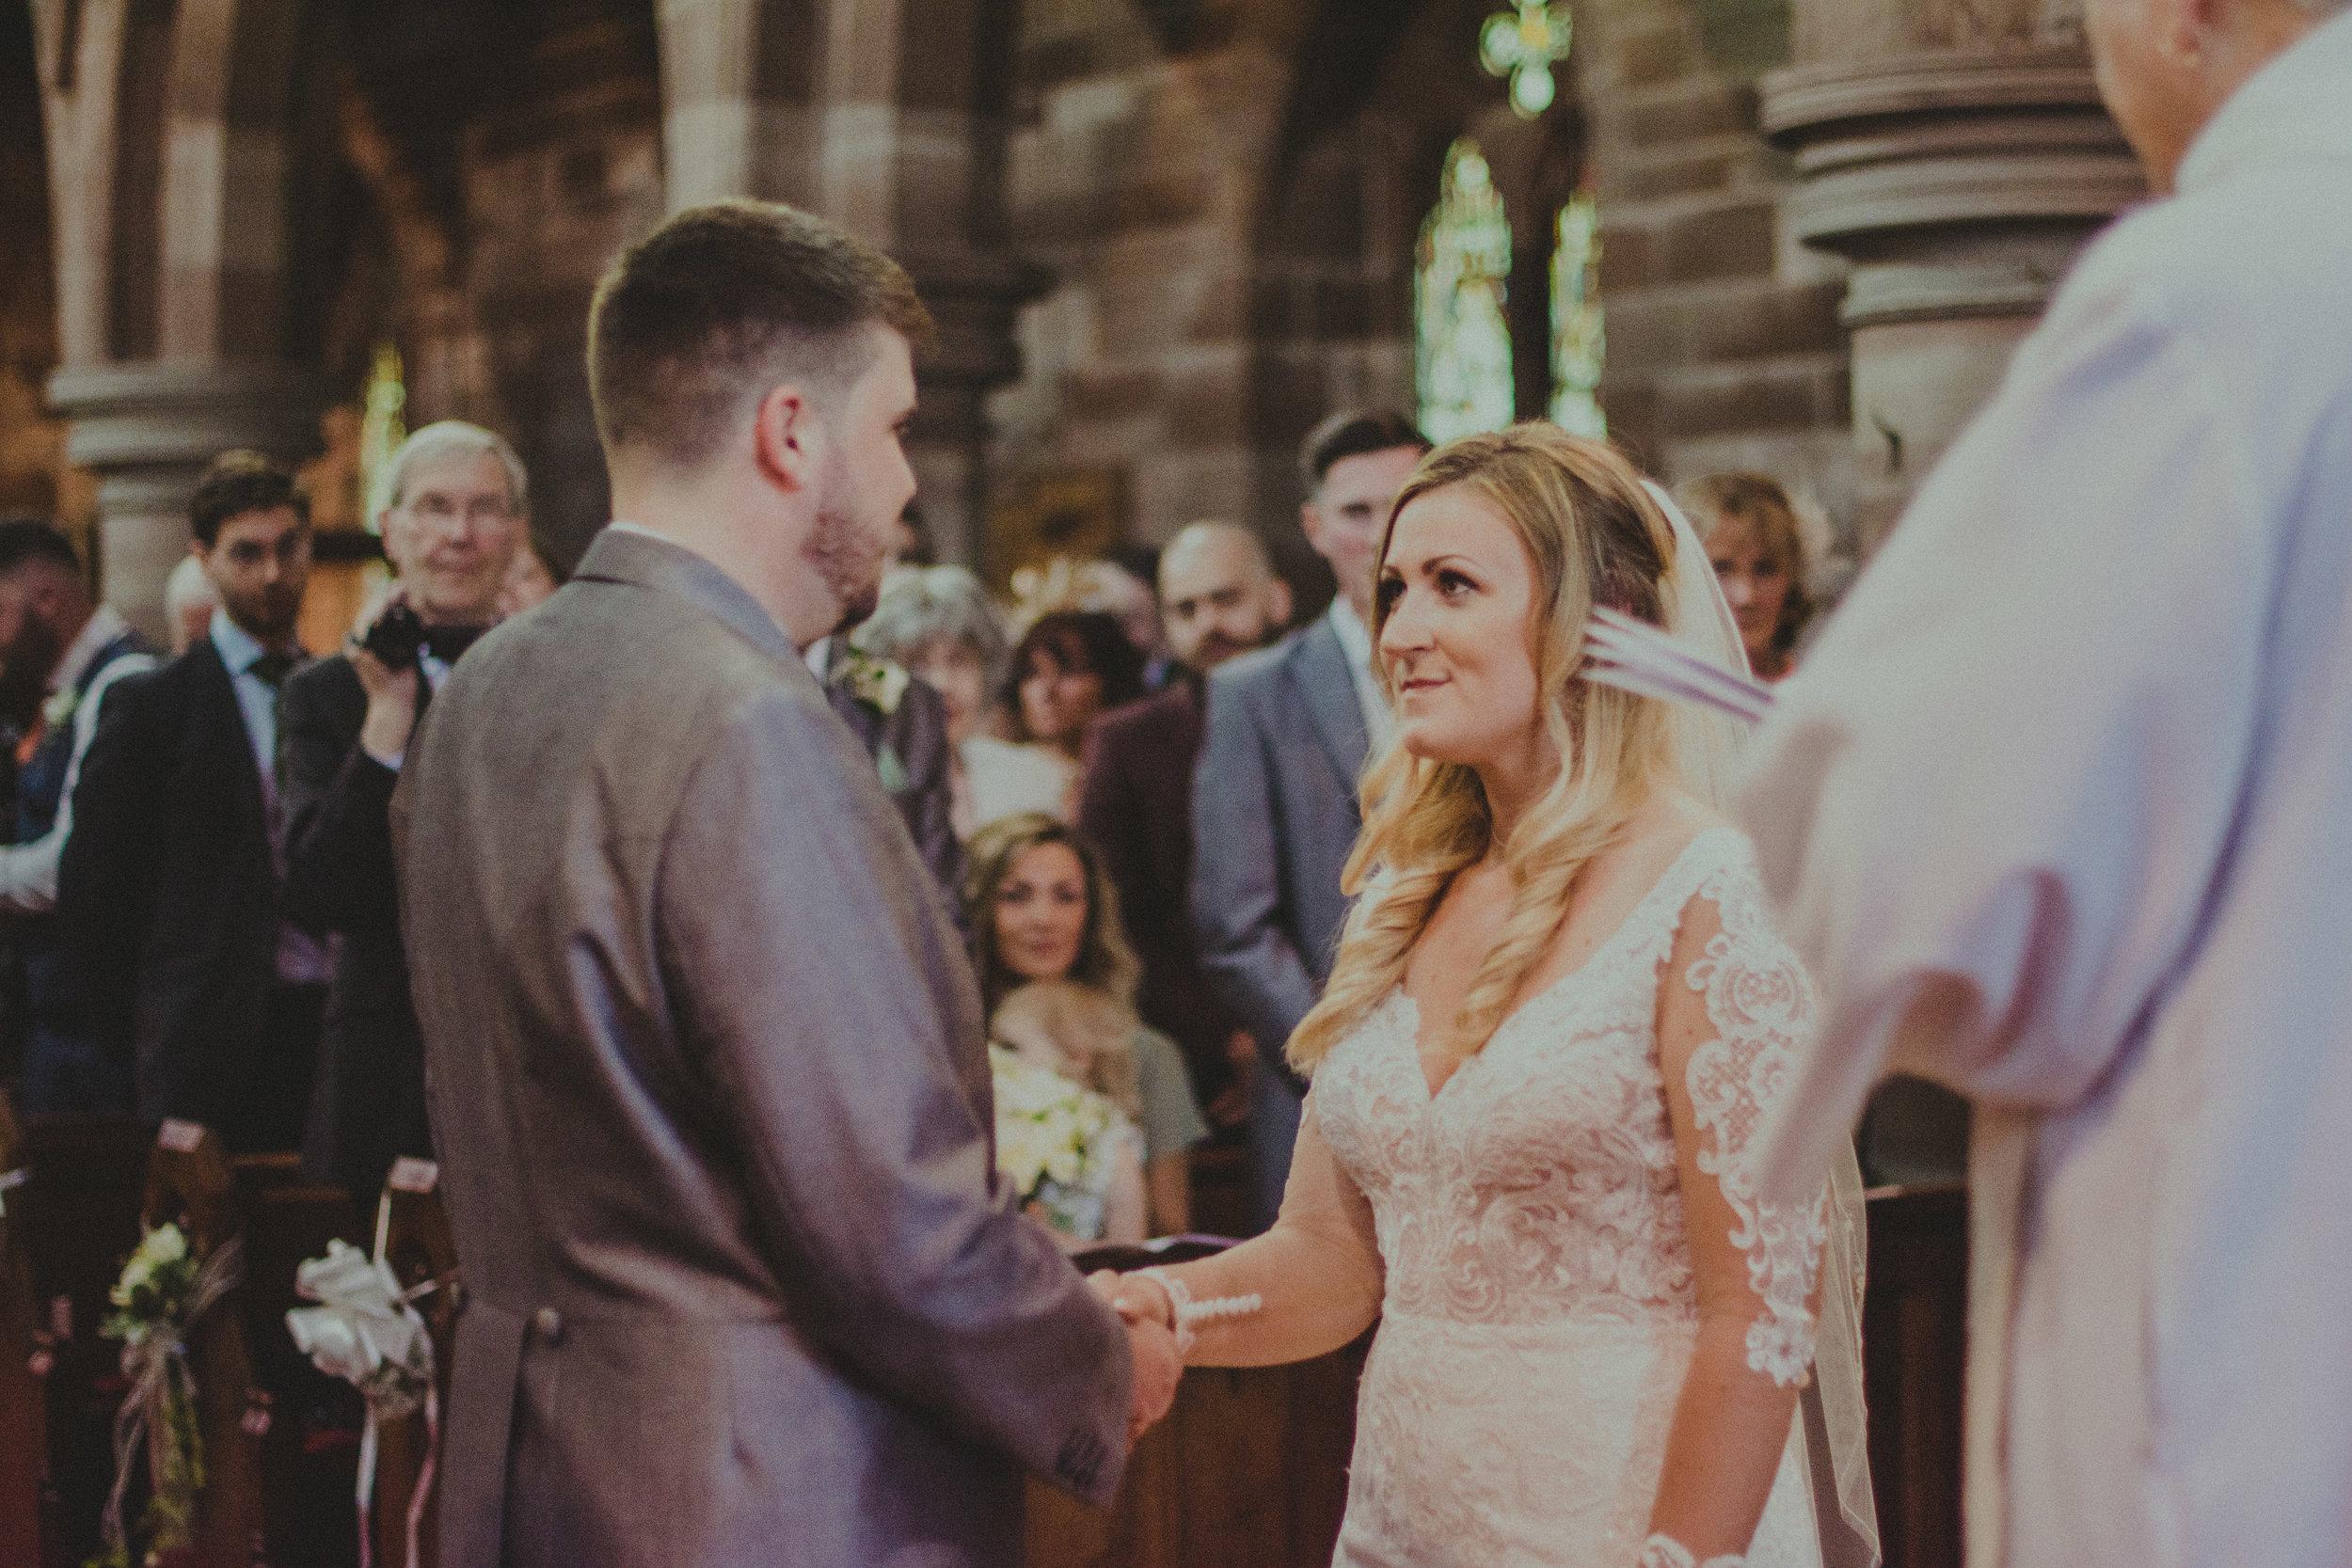 Cheshire wedding Photographer wedding photographer engagement photographer carlisle wedding photographer Glasgow wedding photographer lancashire wedding photographer (1 of 1)-11.jpg